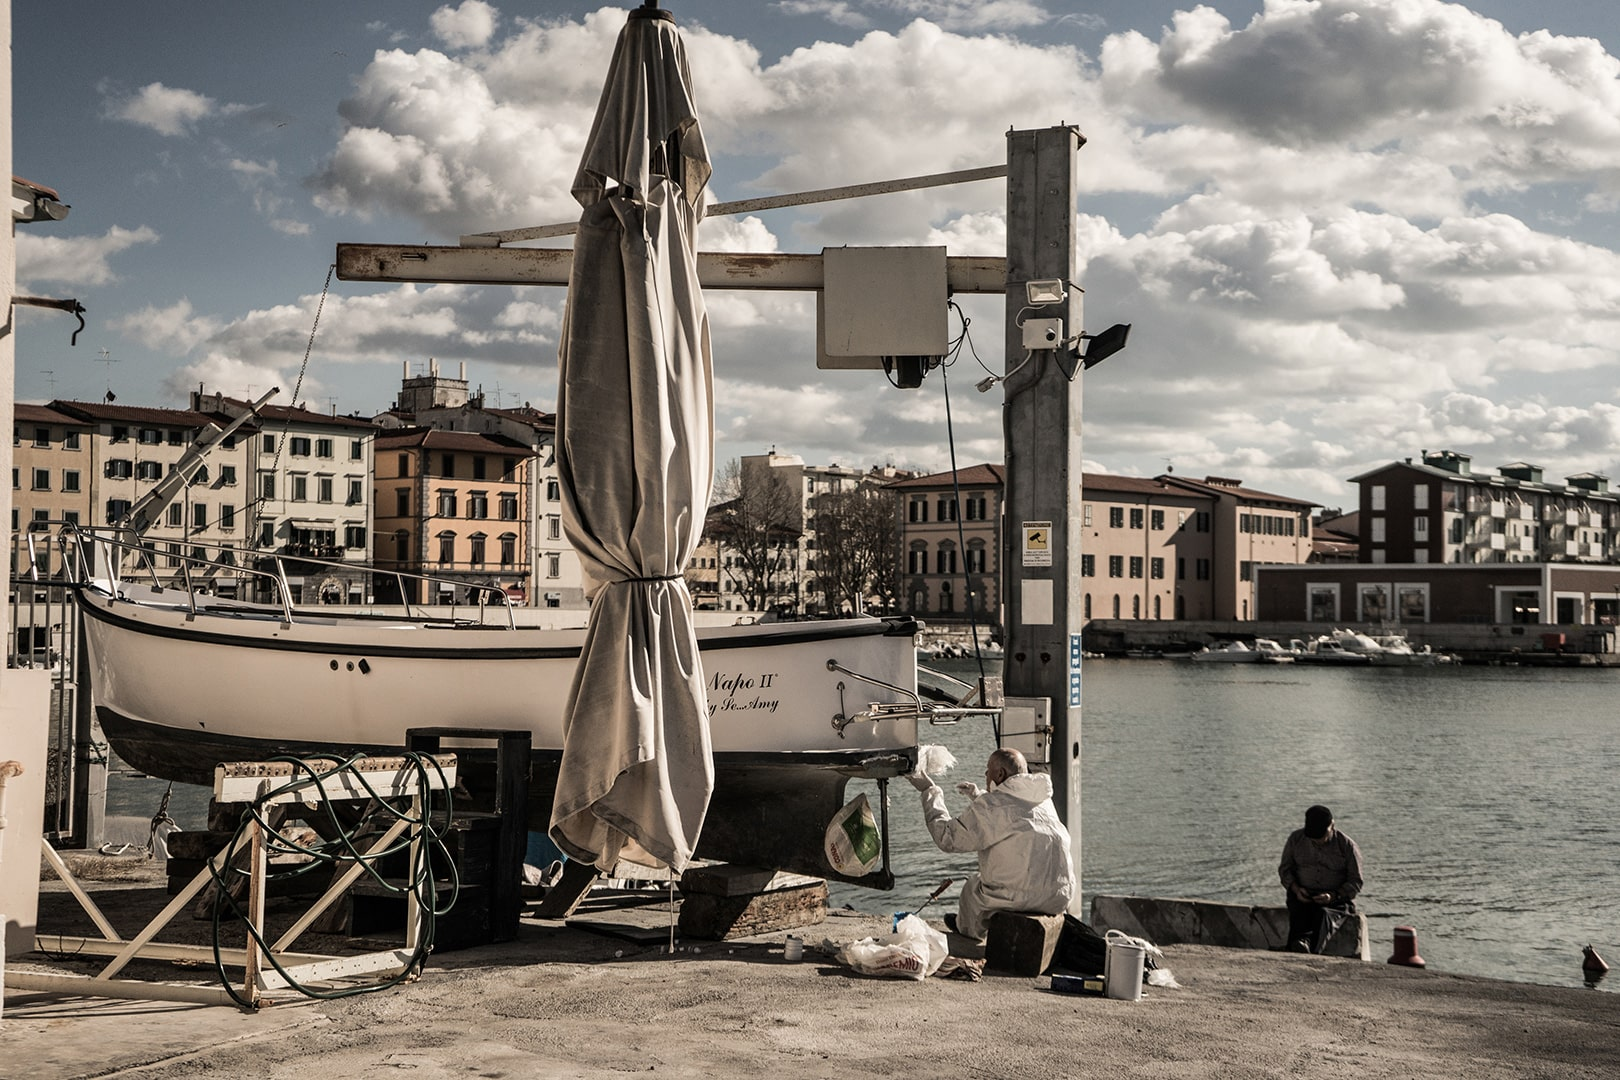 foto di Francesca Mia Guarnieri